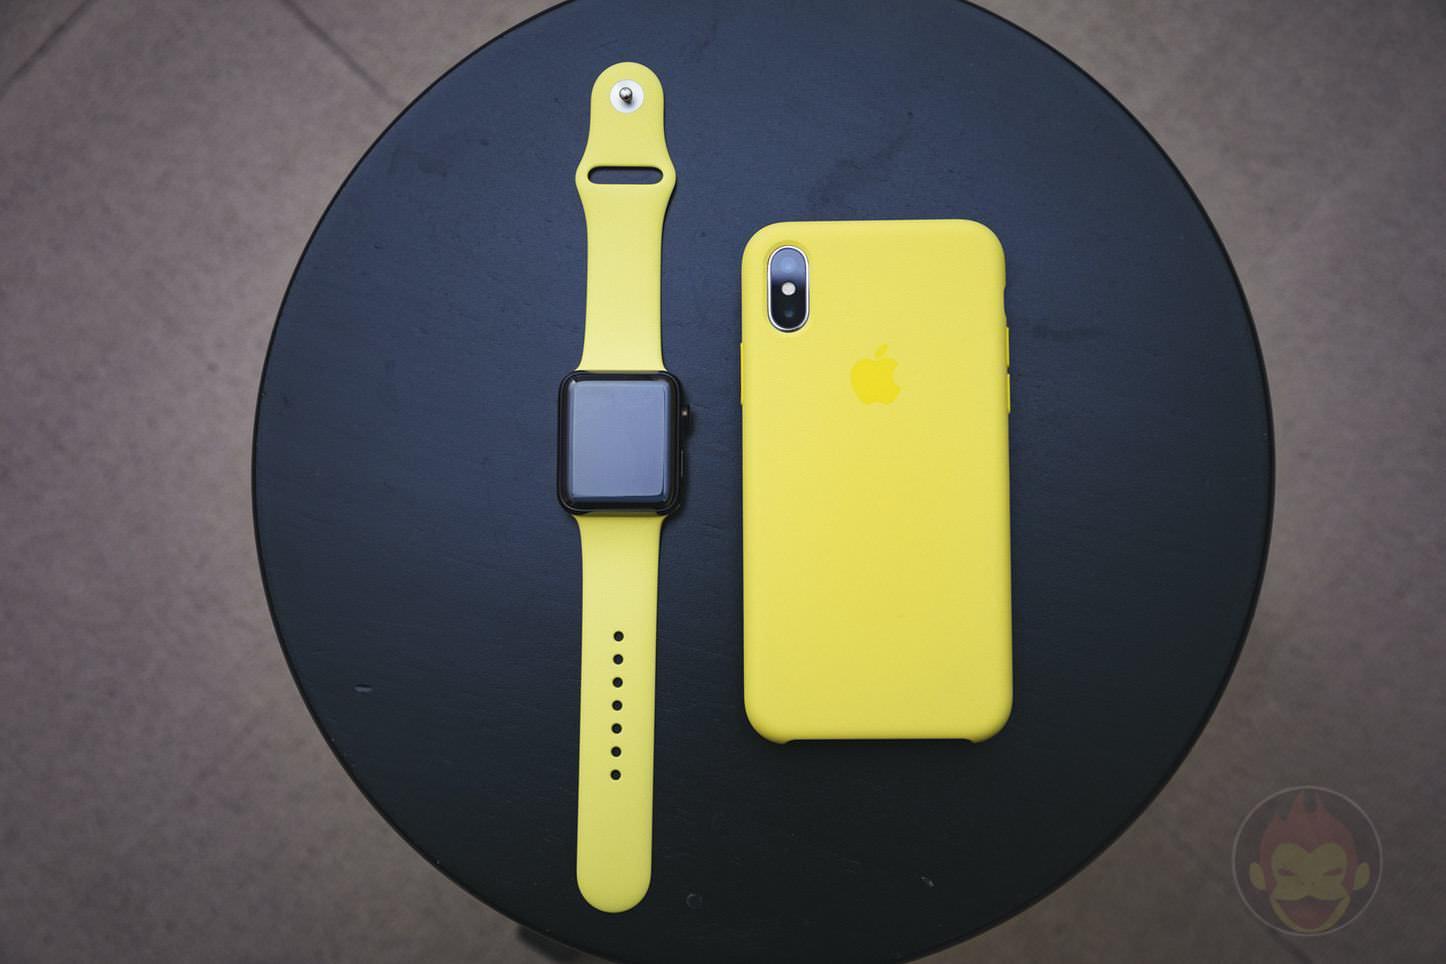 Apple-Watch-Sport-Band-Combination-09.jpg